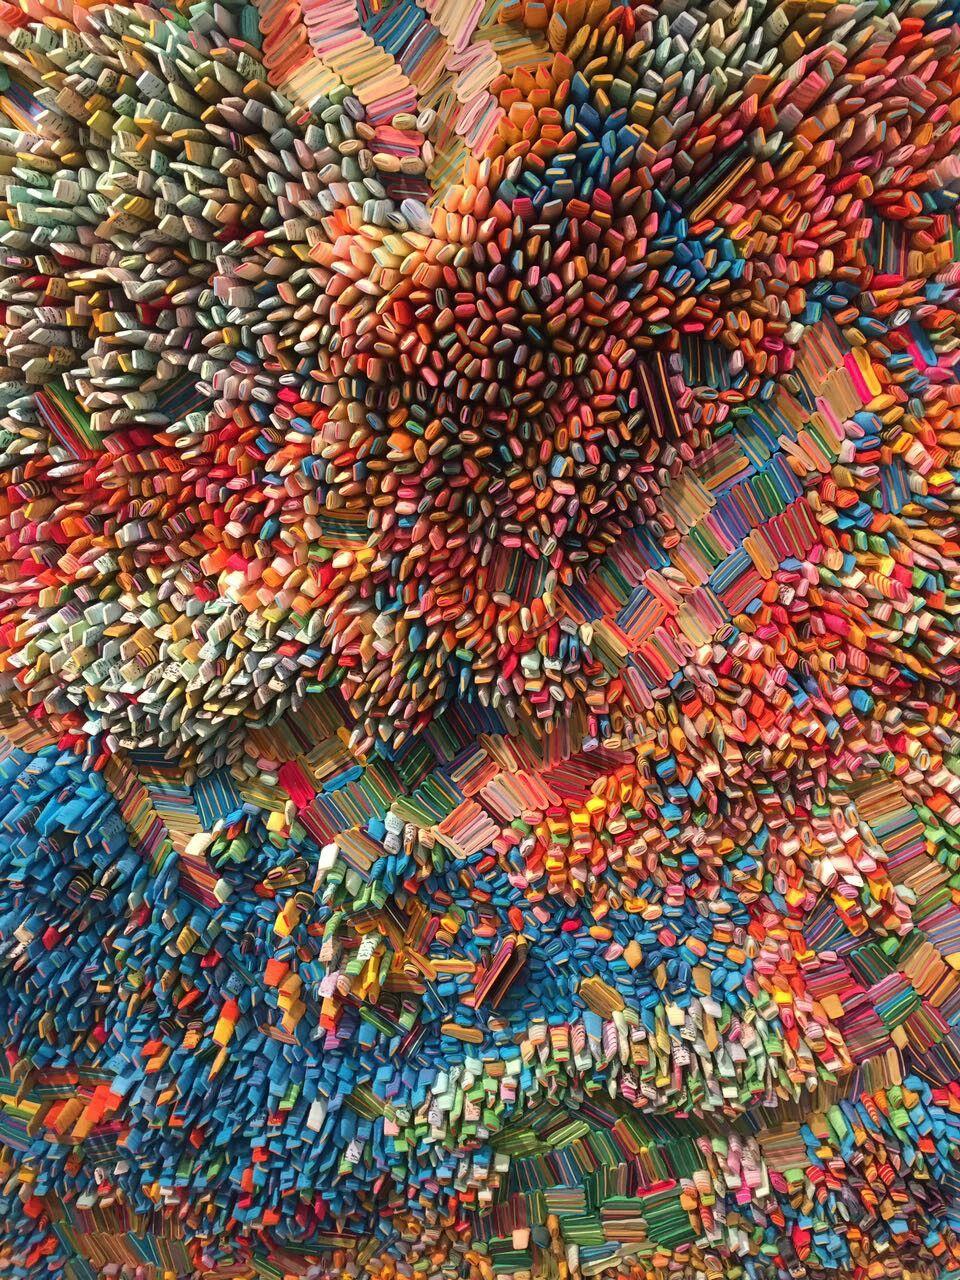 Installation with Paper Miami | Art | Pinterest